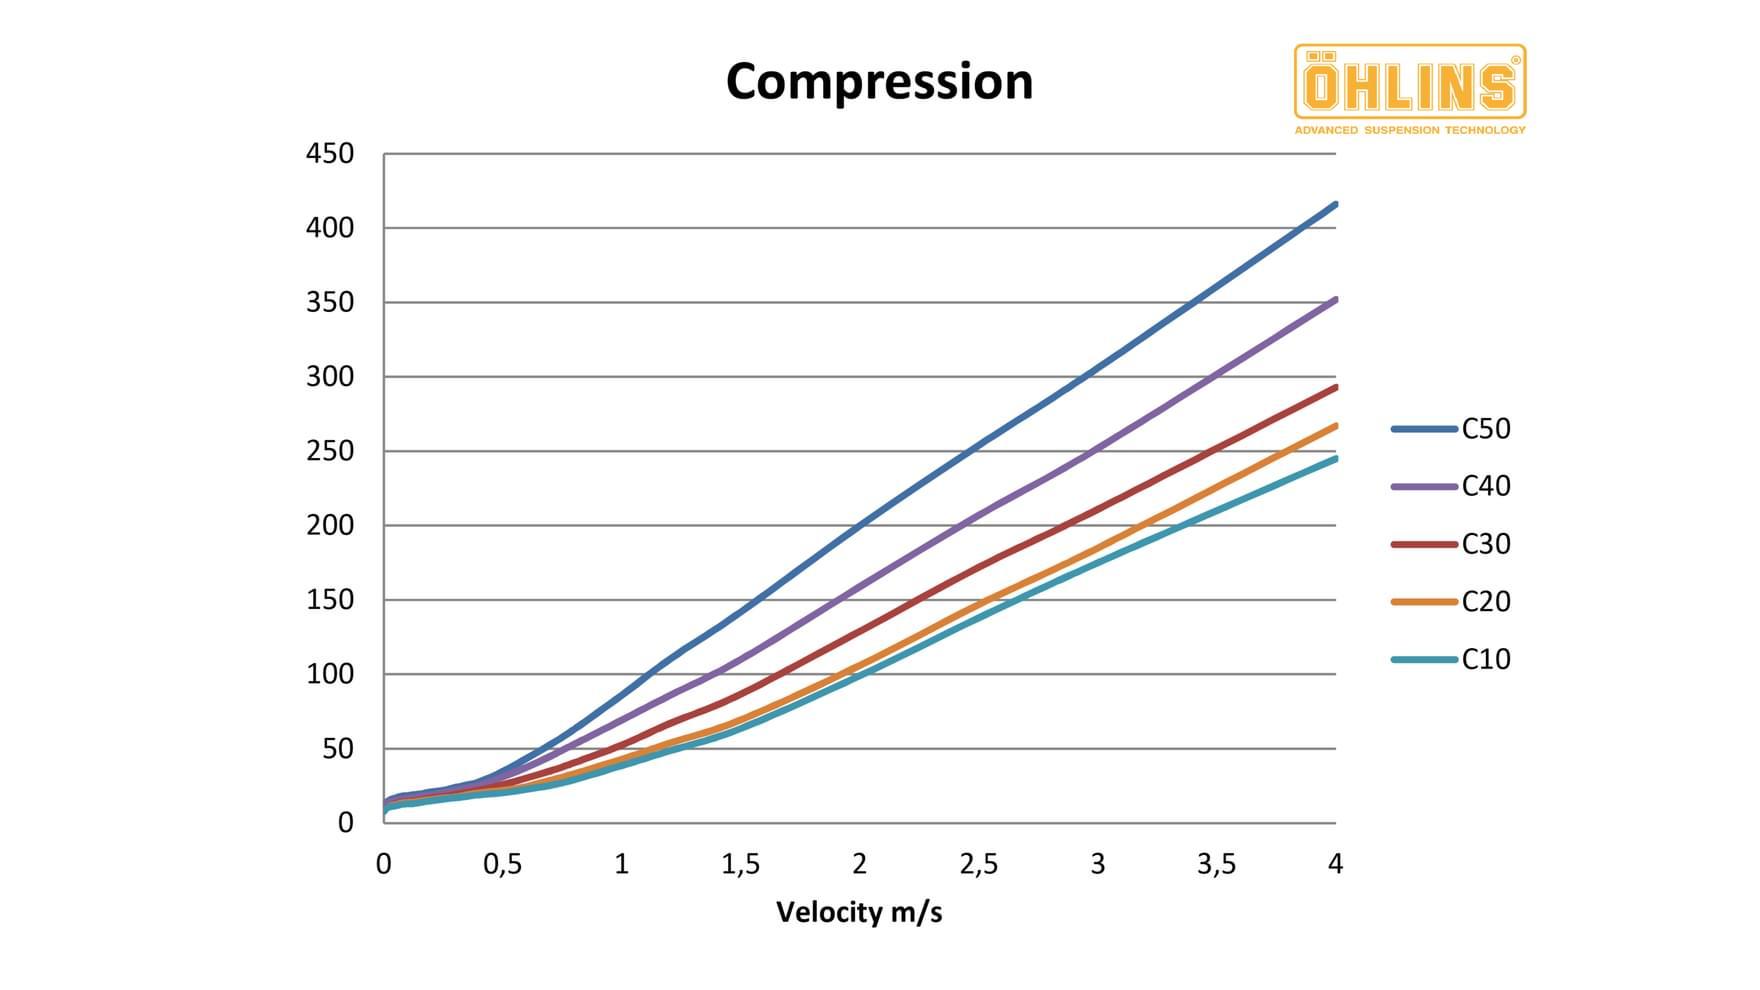 Ohlins Custom Tuning Compression Chart